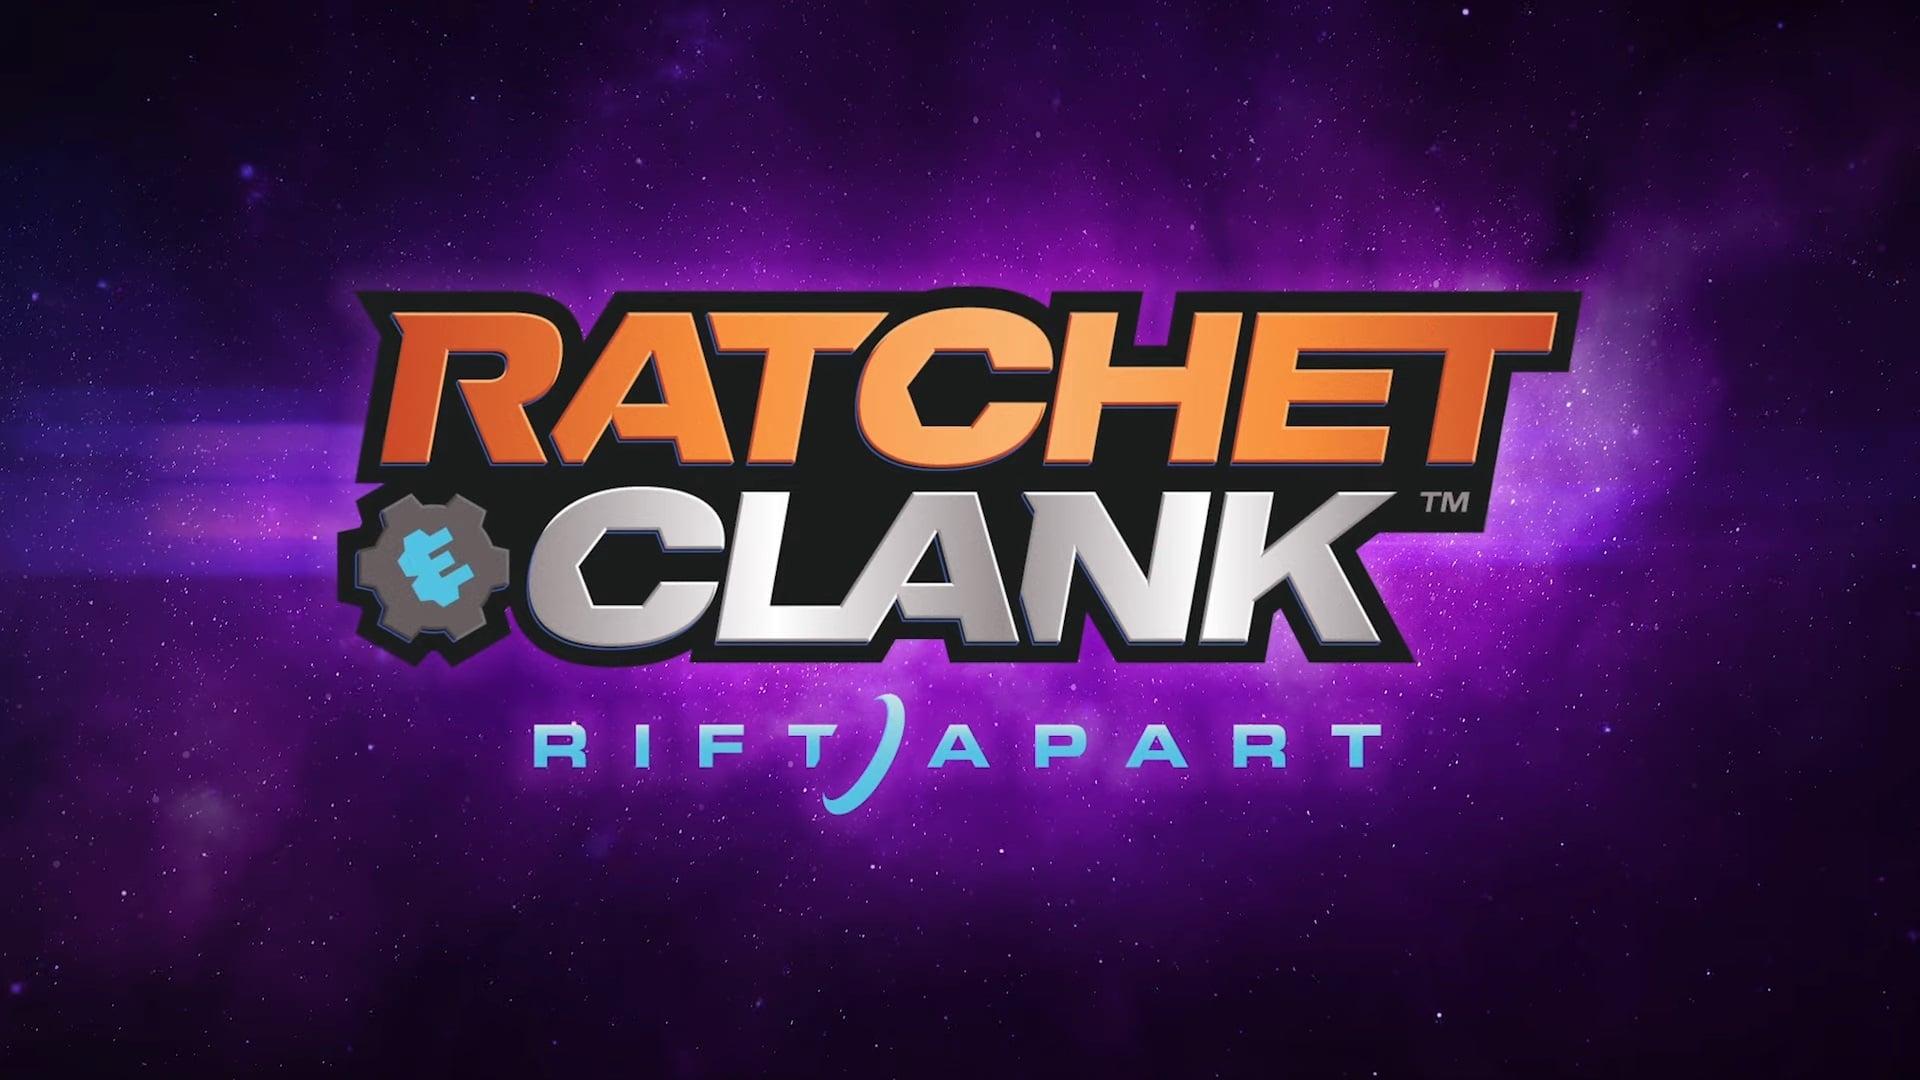 Ratche & Clank: Rift Apart